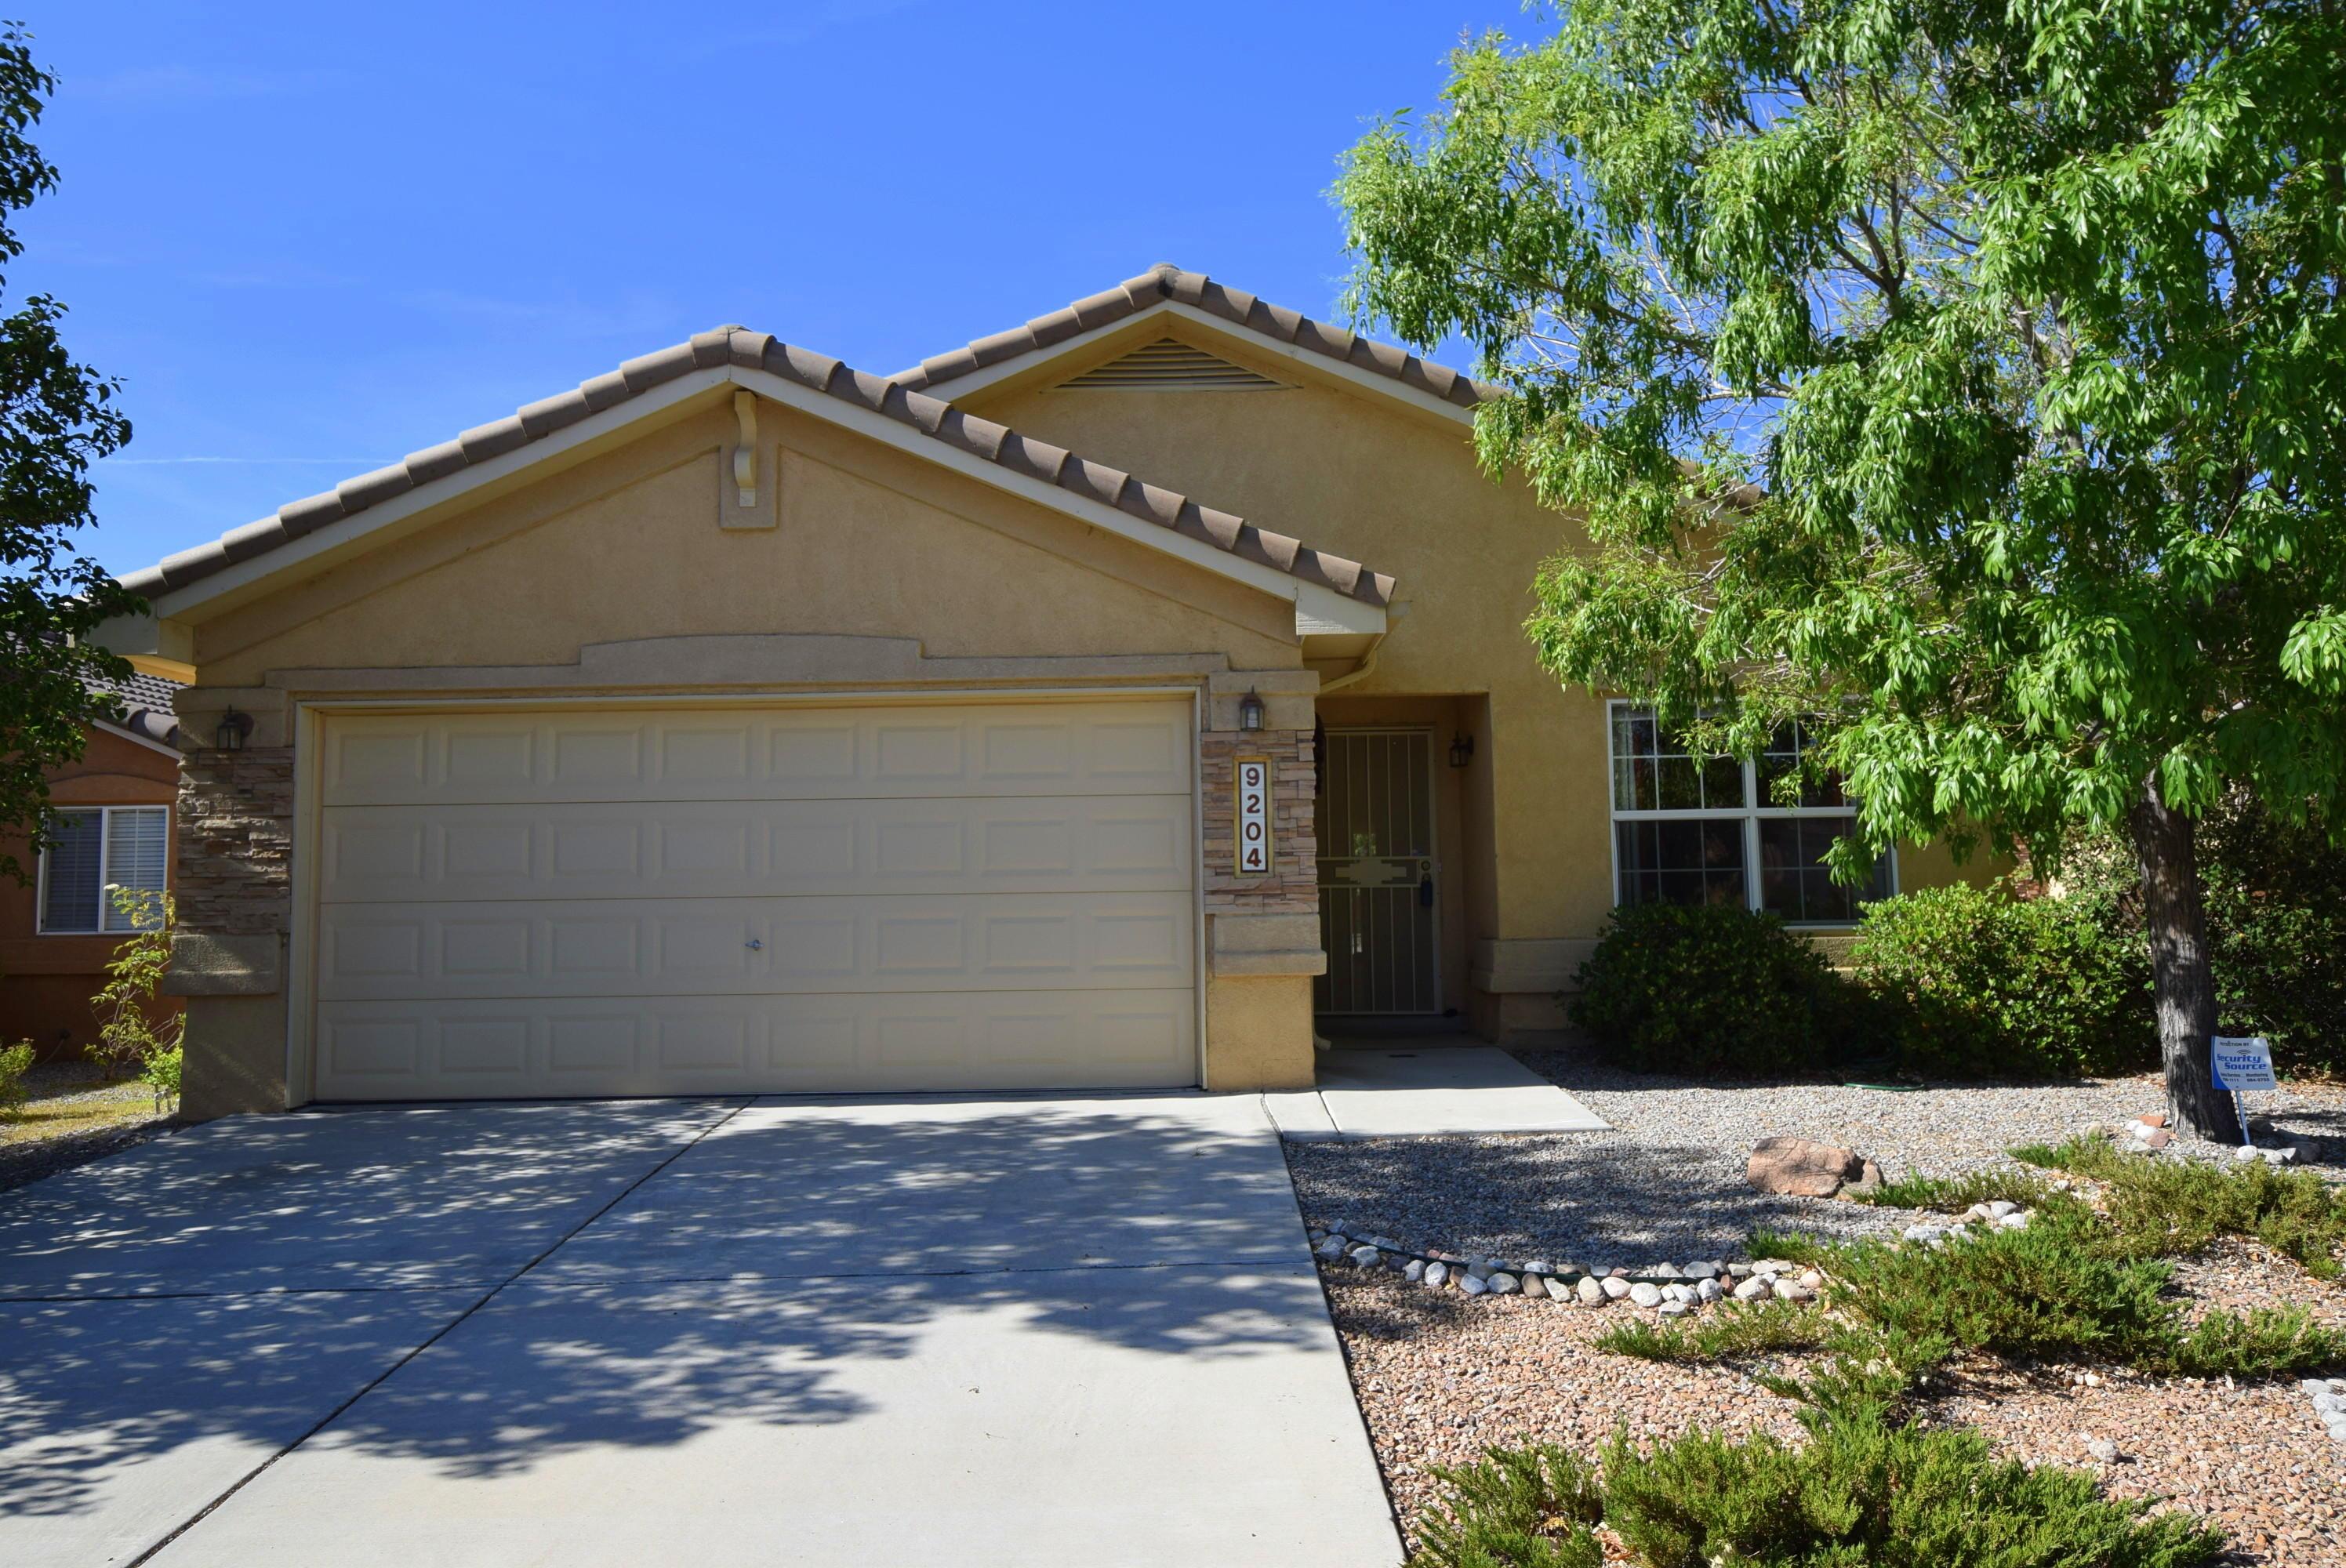 9204 NW Sundoro Place, Northwest Albuquerque and Northwest Heights, New Mexico